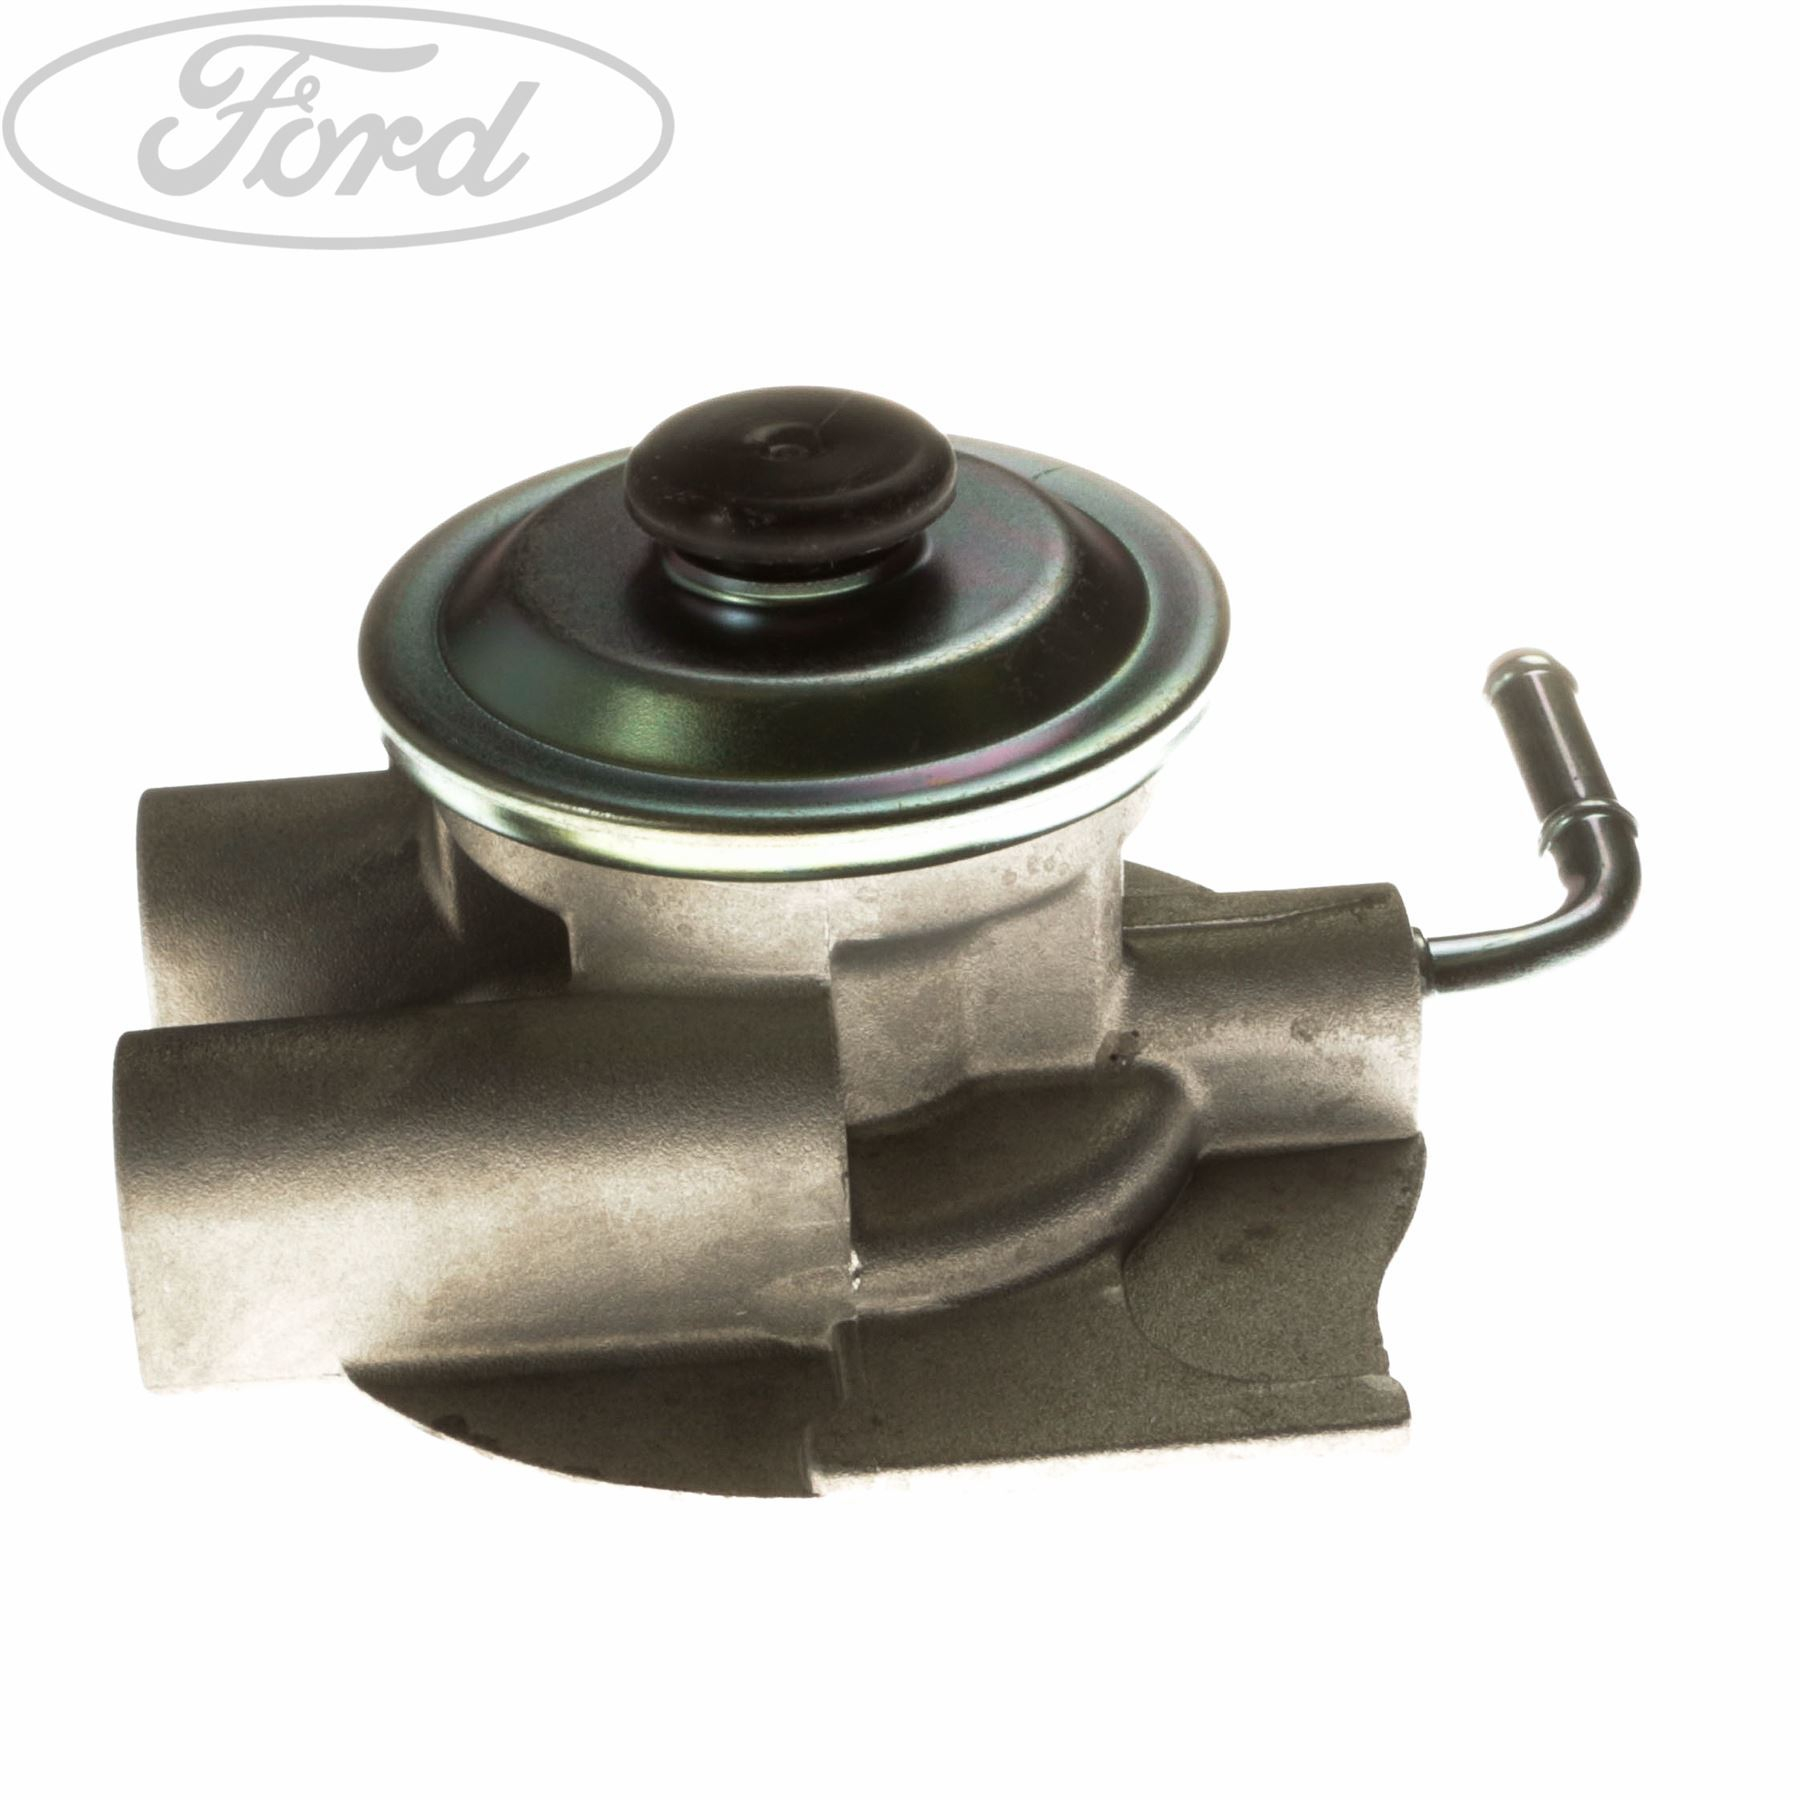 hight resolution of genuine ford ranger 2 2 2 4 tdci everest diesel fuel filter body pump 3950878